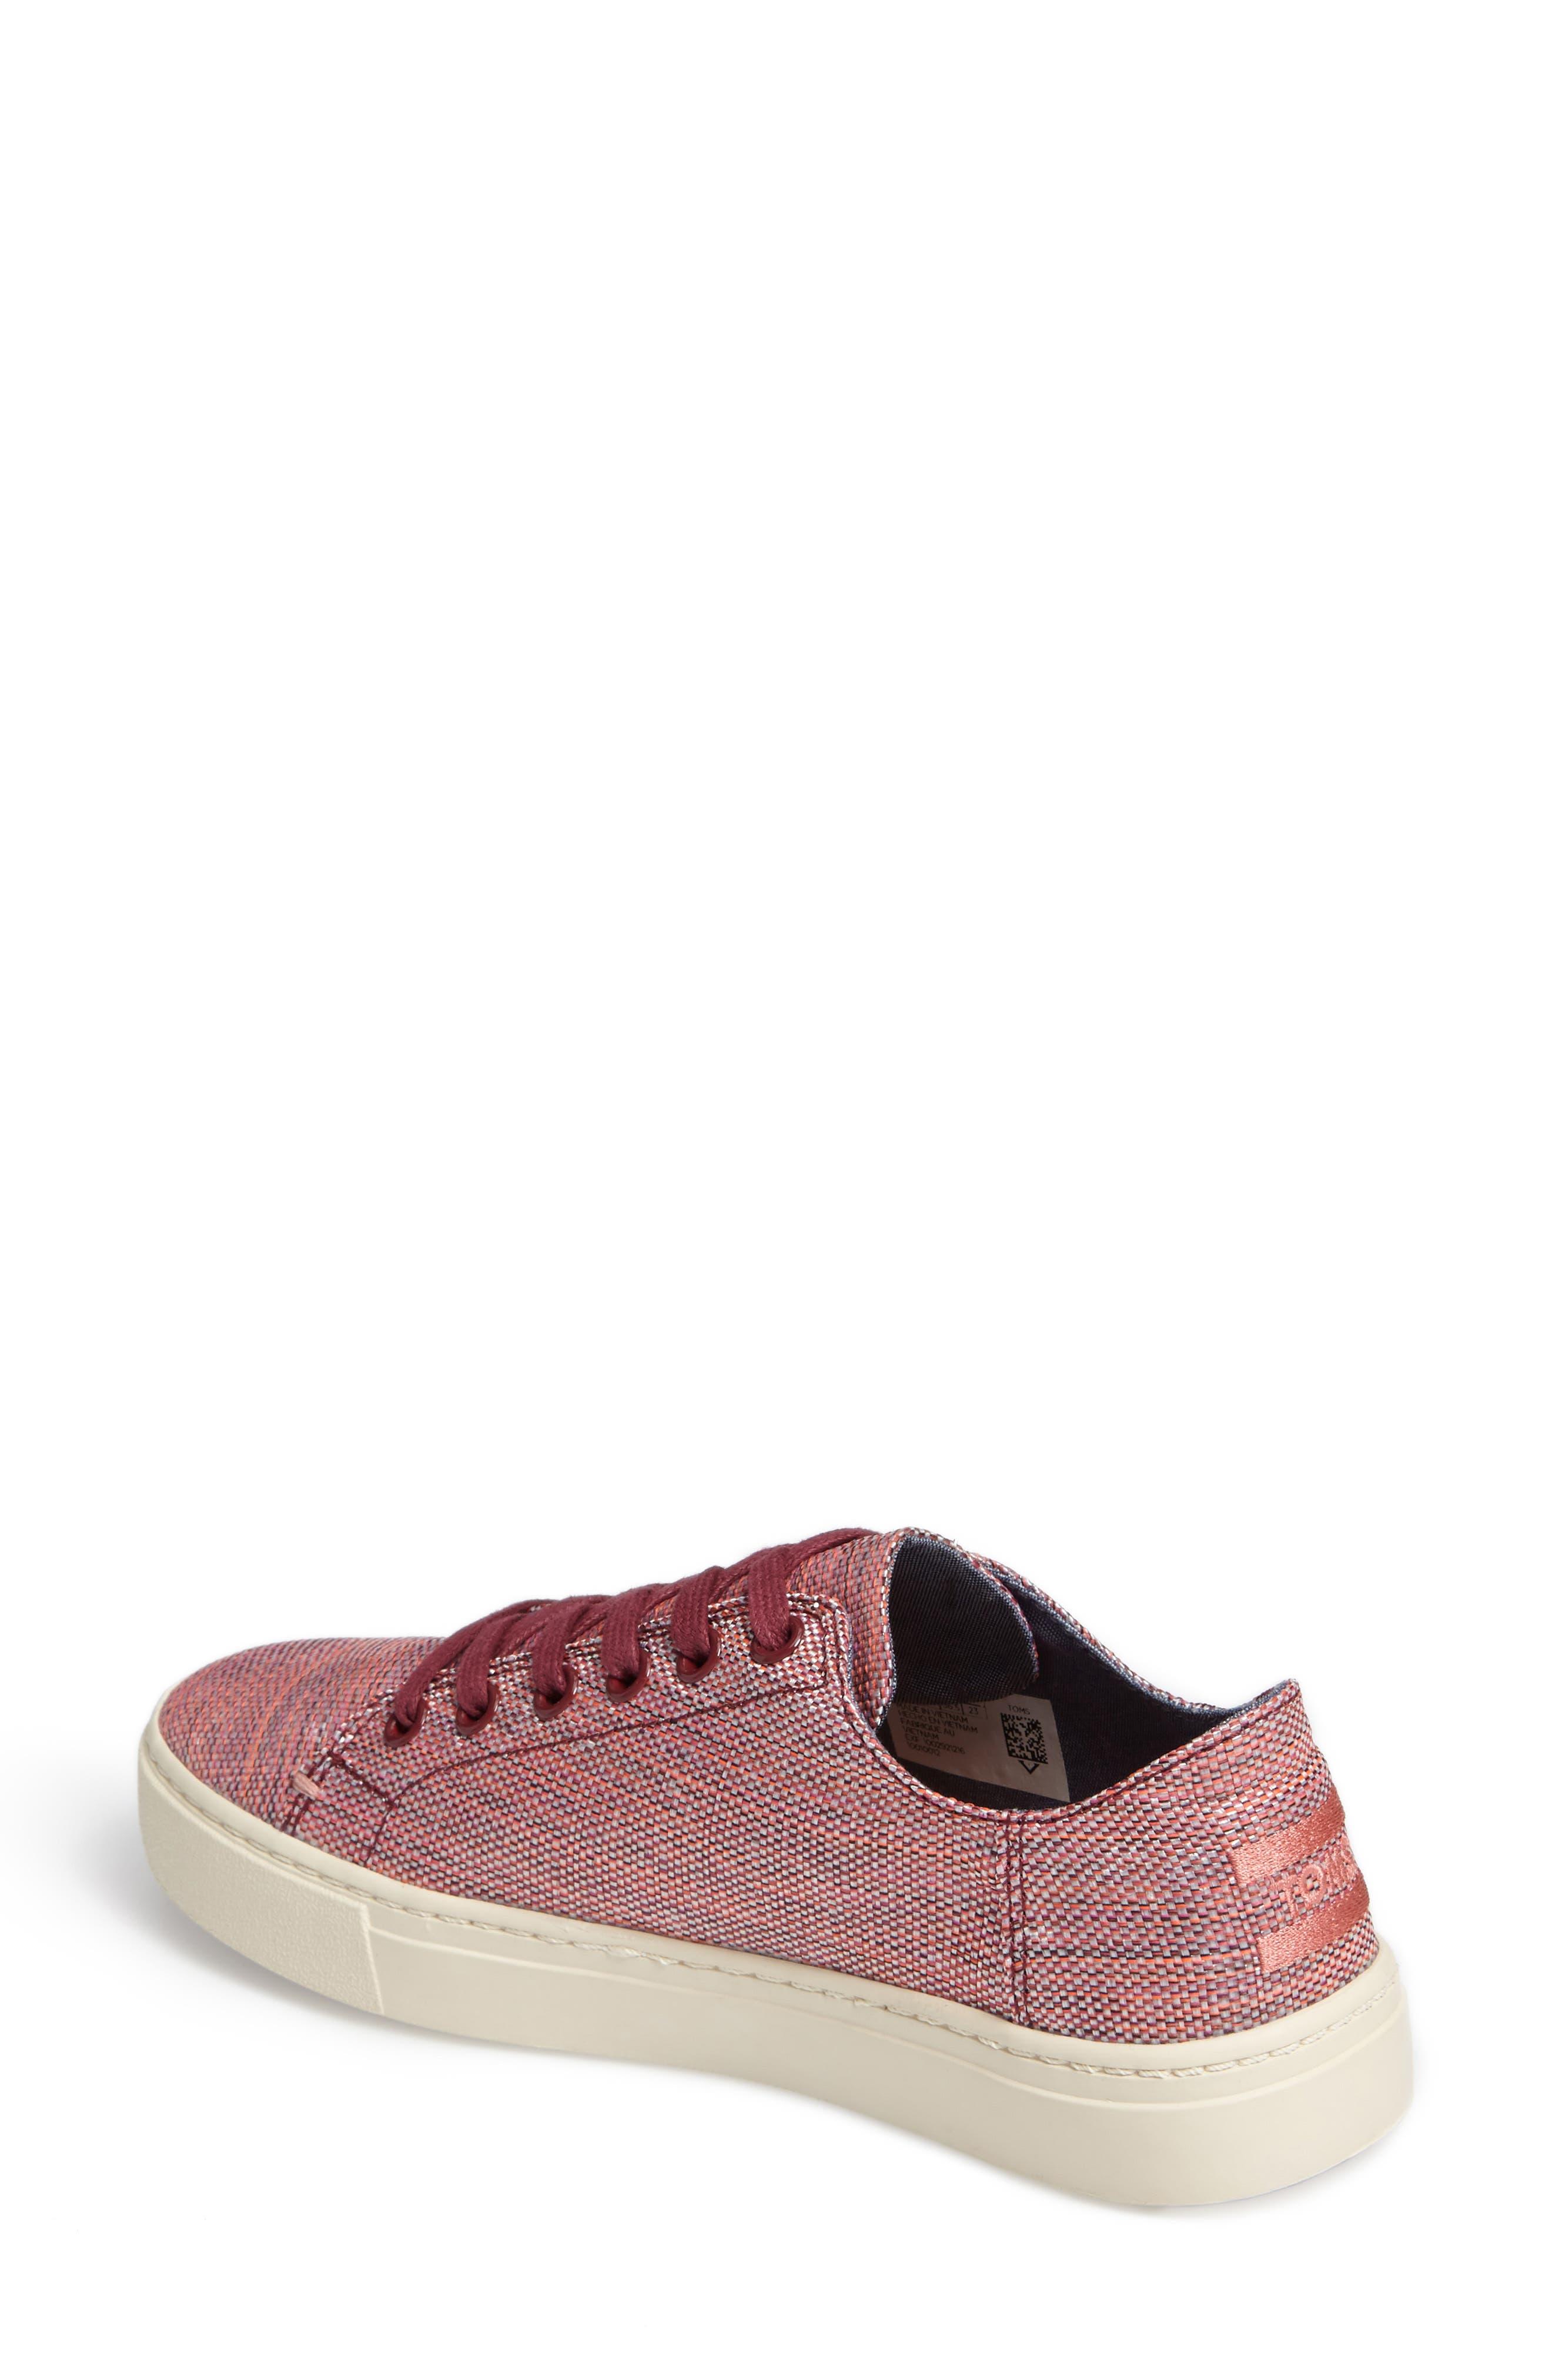 Lenox Sneaker,                             Alternate thumbnail 32, color,